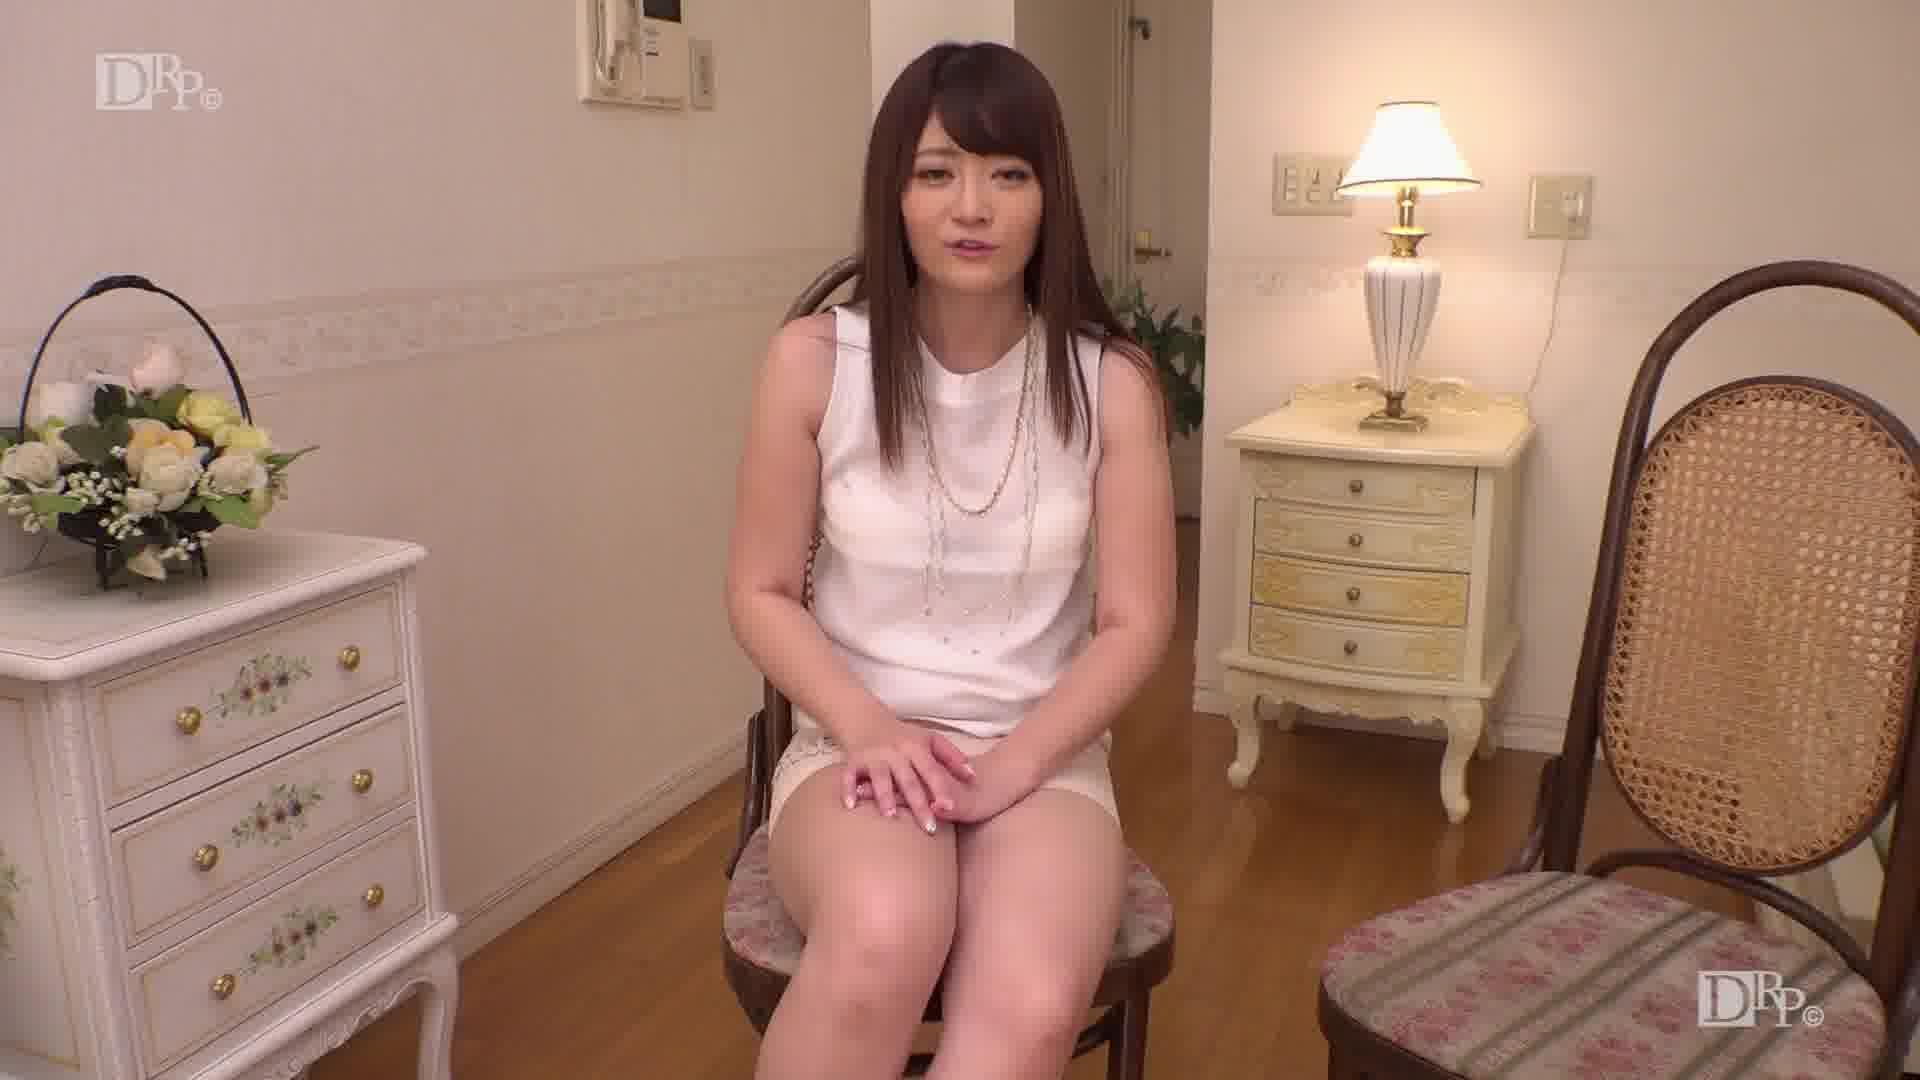 AV女優の仕事明細 - 生島涼【潮吹き・パイパン・中出し】